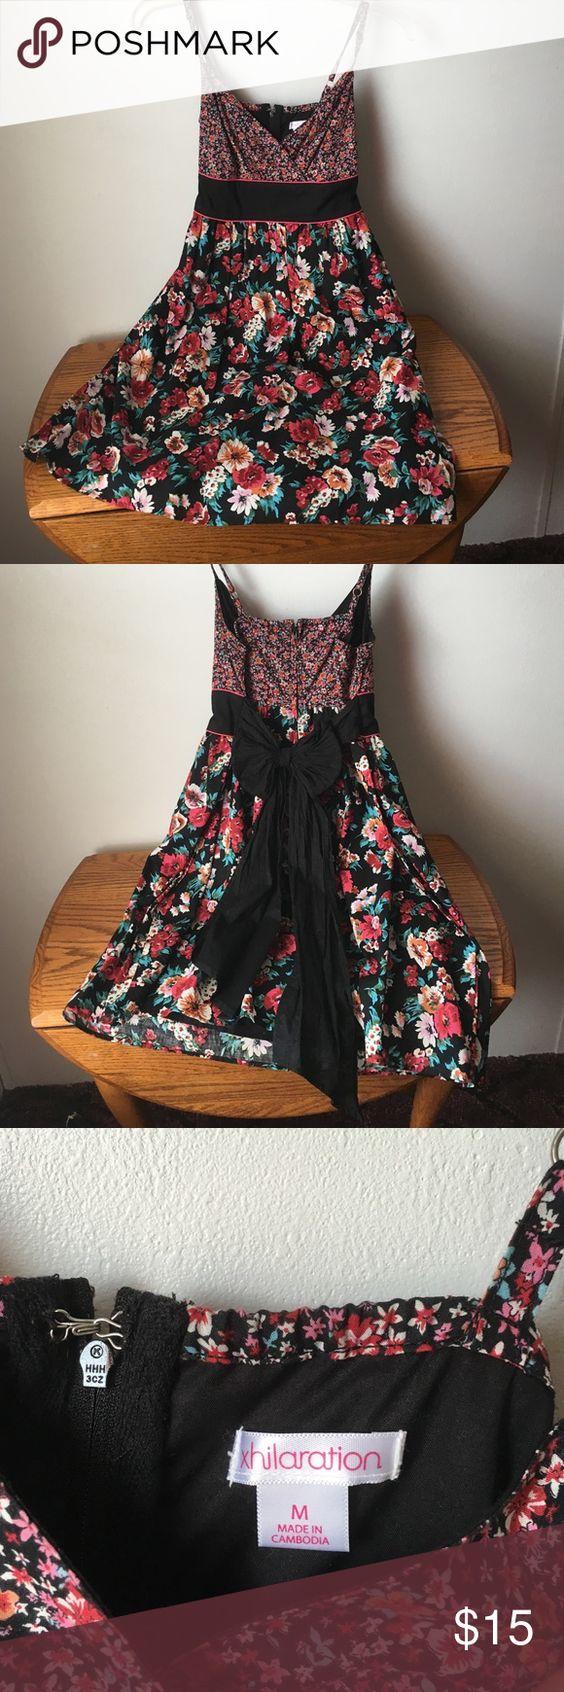 A floral summer dress size medium A very cute floral dress size medium juniors gently used Xhilaration Dresses Mini